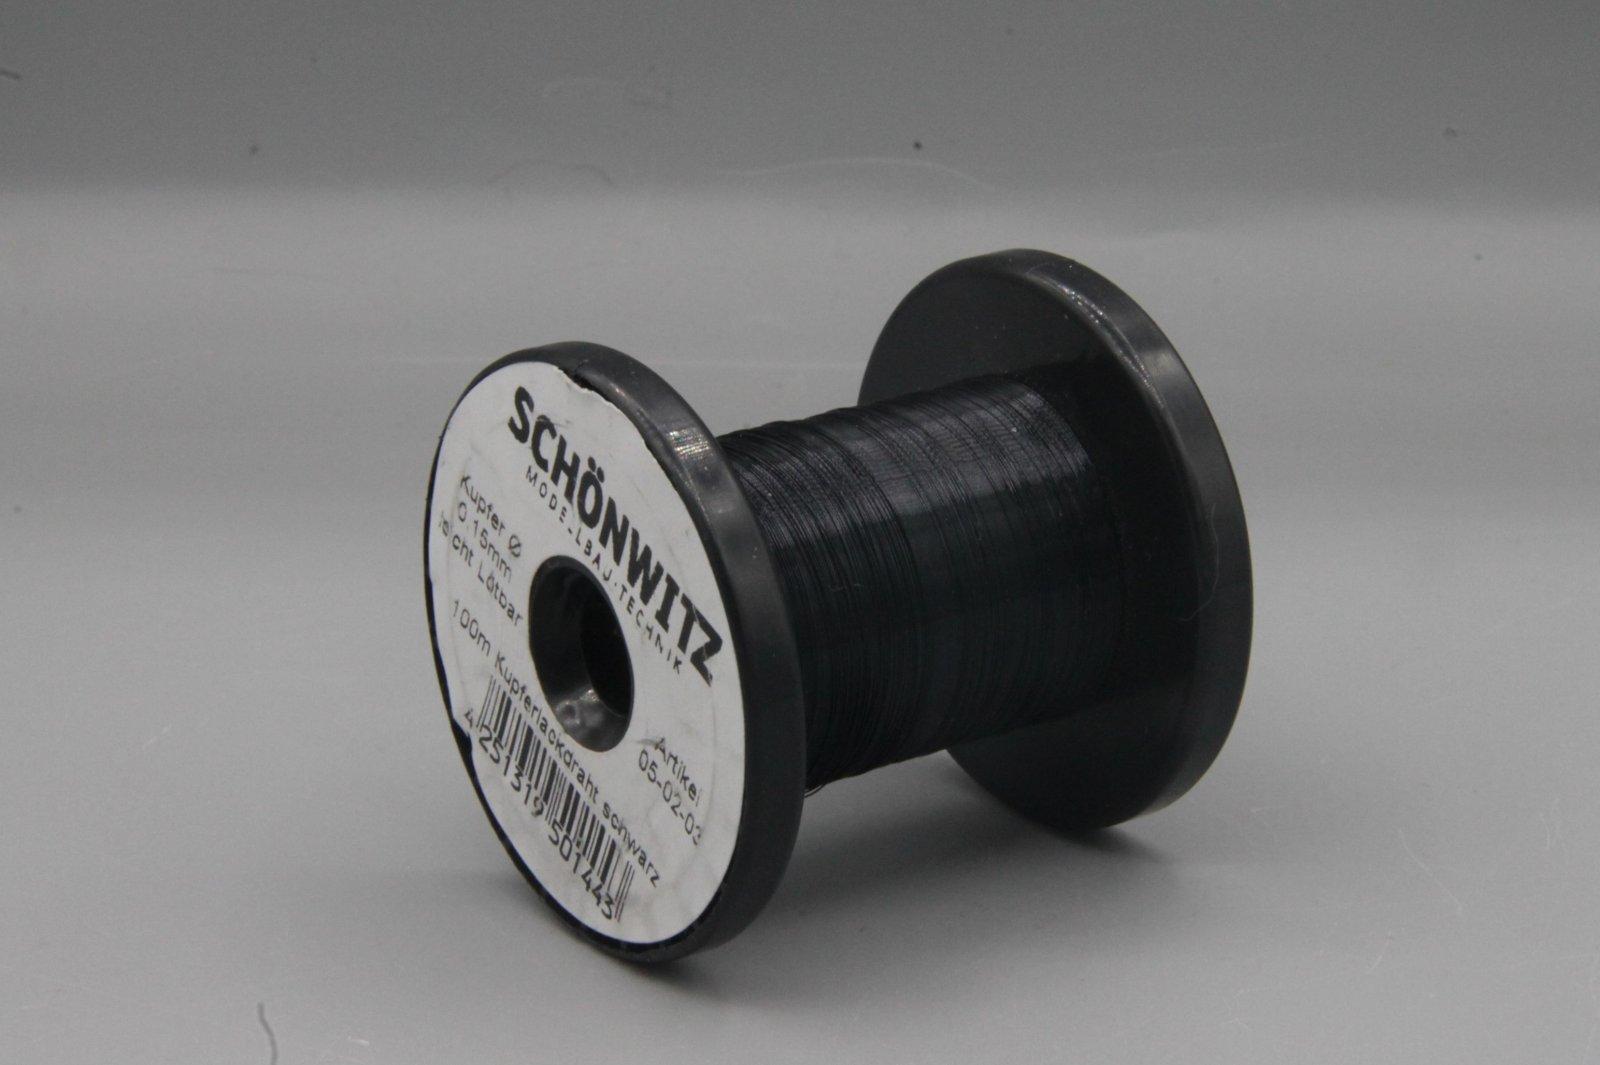 100 m Kupferlackdraht schwarz 0,15 mm Lackdraht Cu-Draht auf 50m-Spule